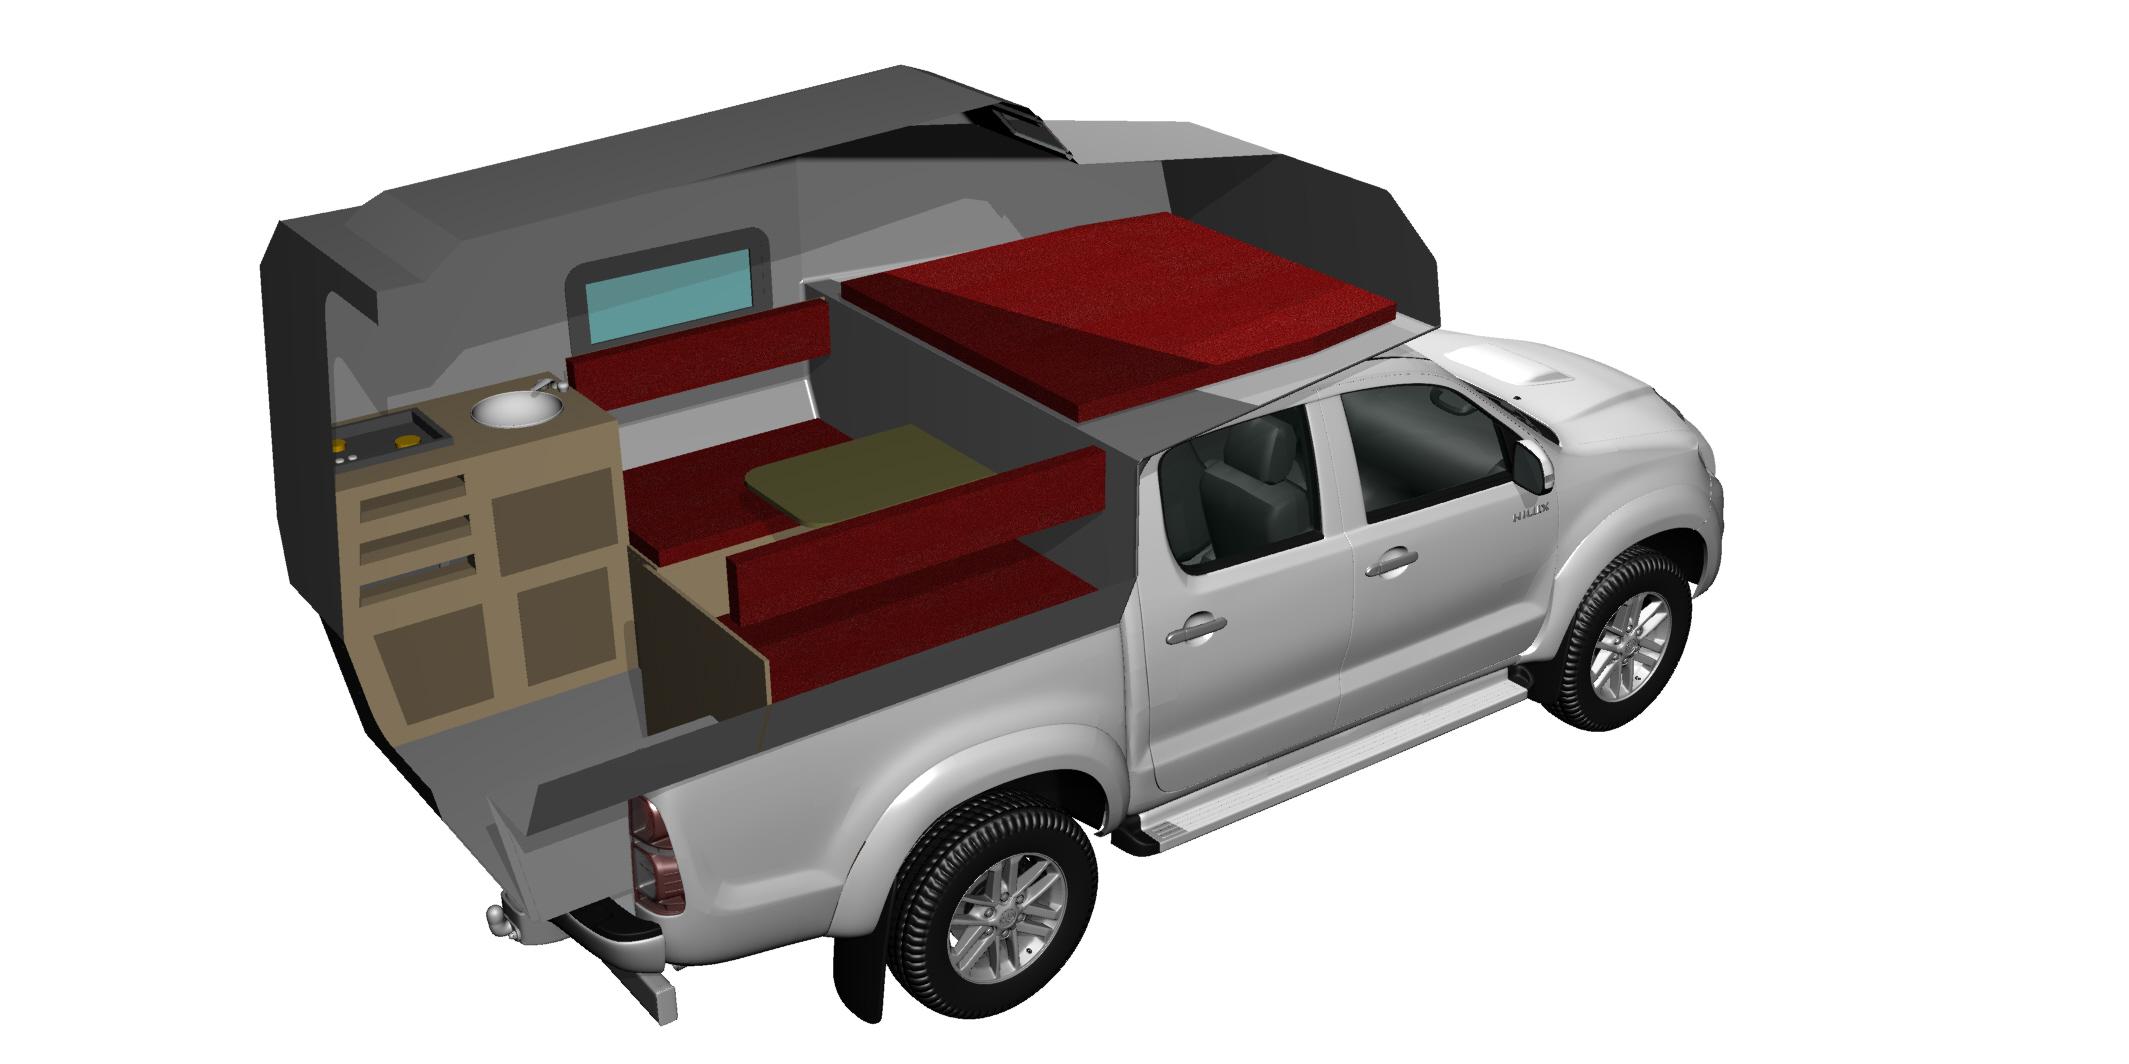 cellule pickup amovible custom camp cellule 4x4. Black Bedroom Furniture Sets. Home Design Ideas